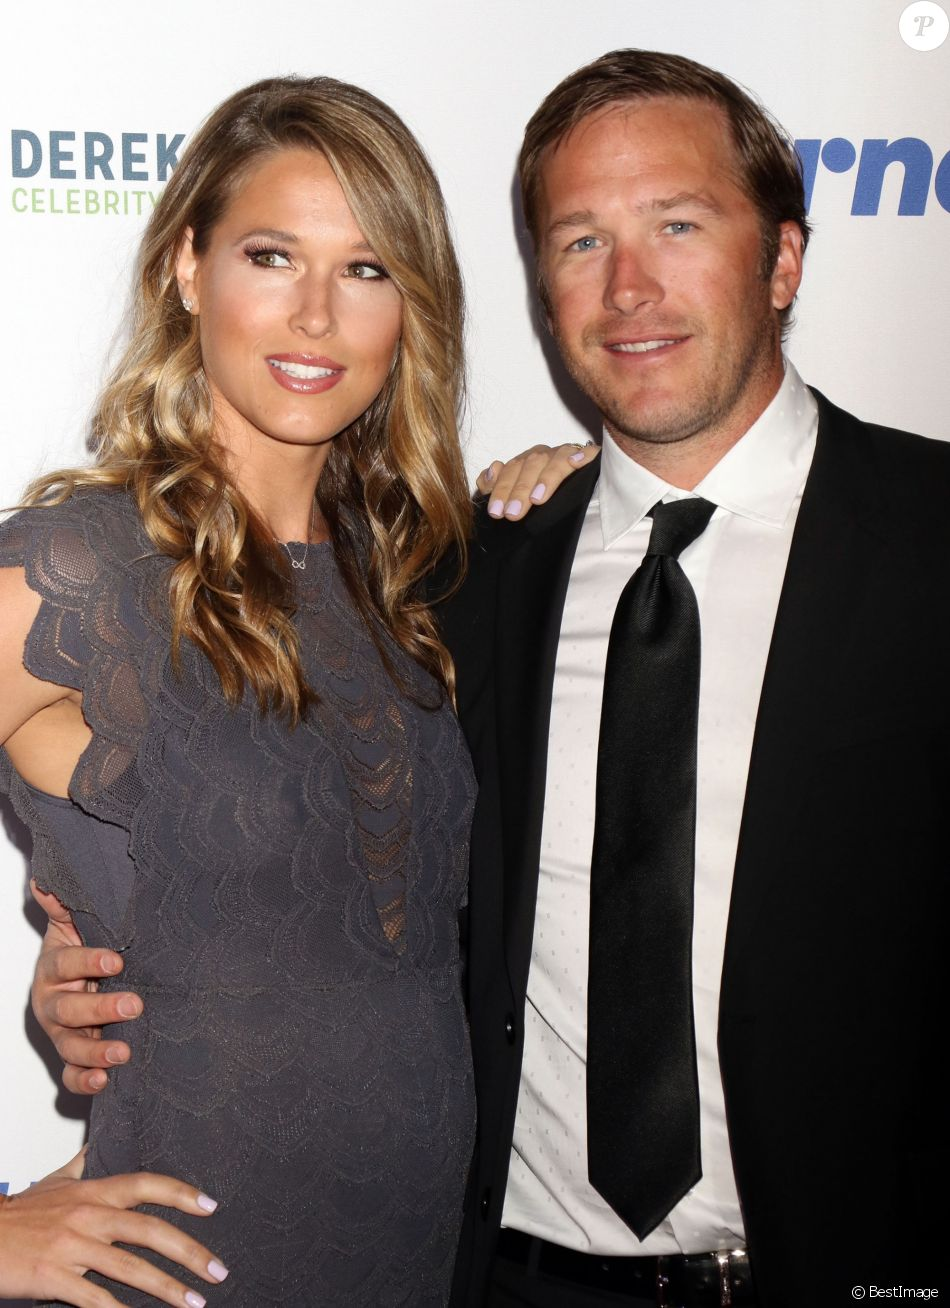 Morgan Beck et son mari Bode Miller au gala international Derek Jeter Celebrity à Aria Resort & Casino à Las vegas, le 21 avril 2016.